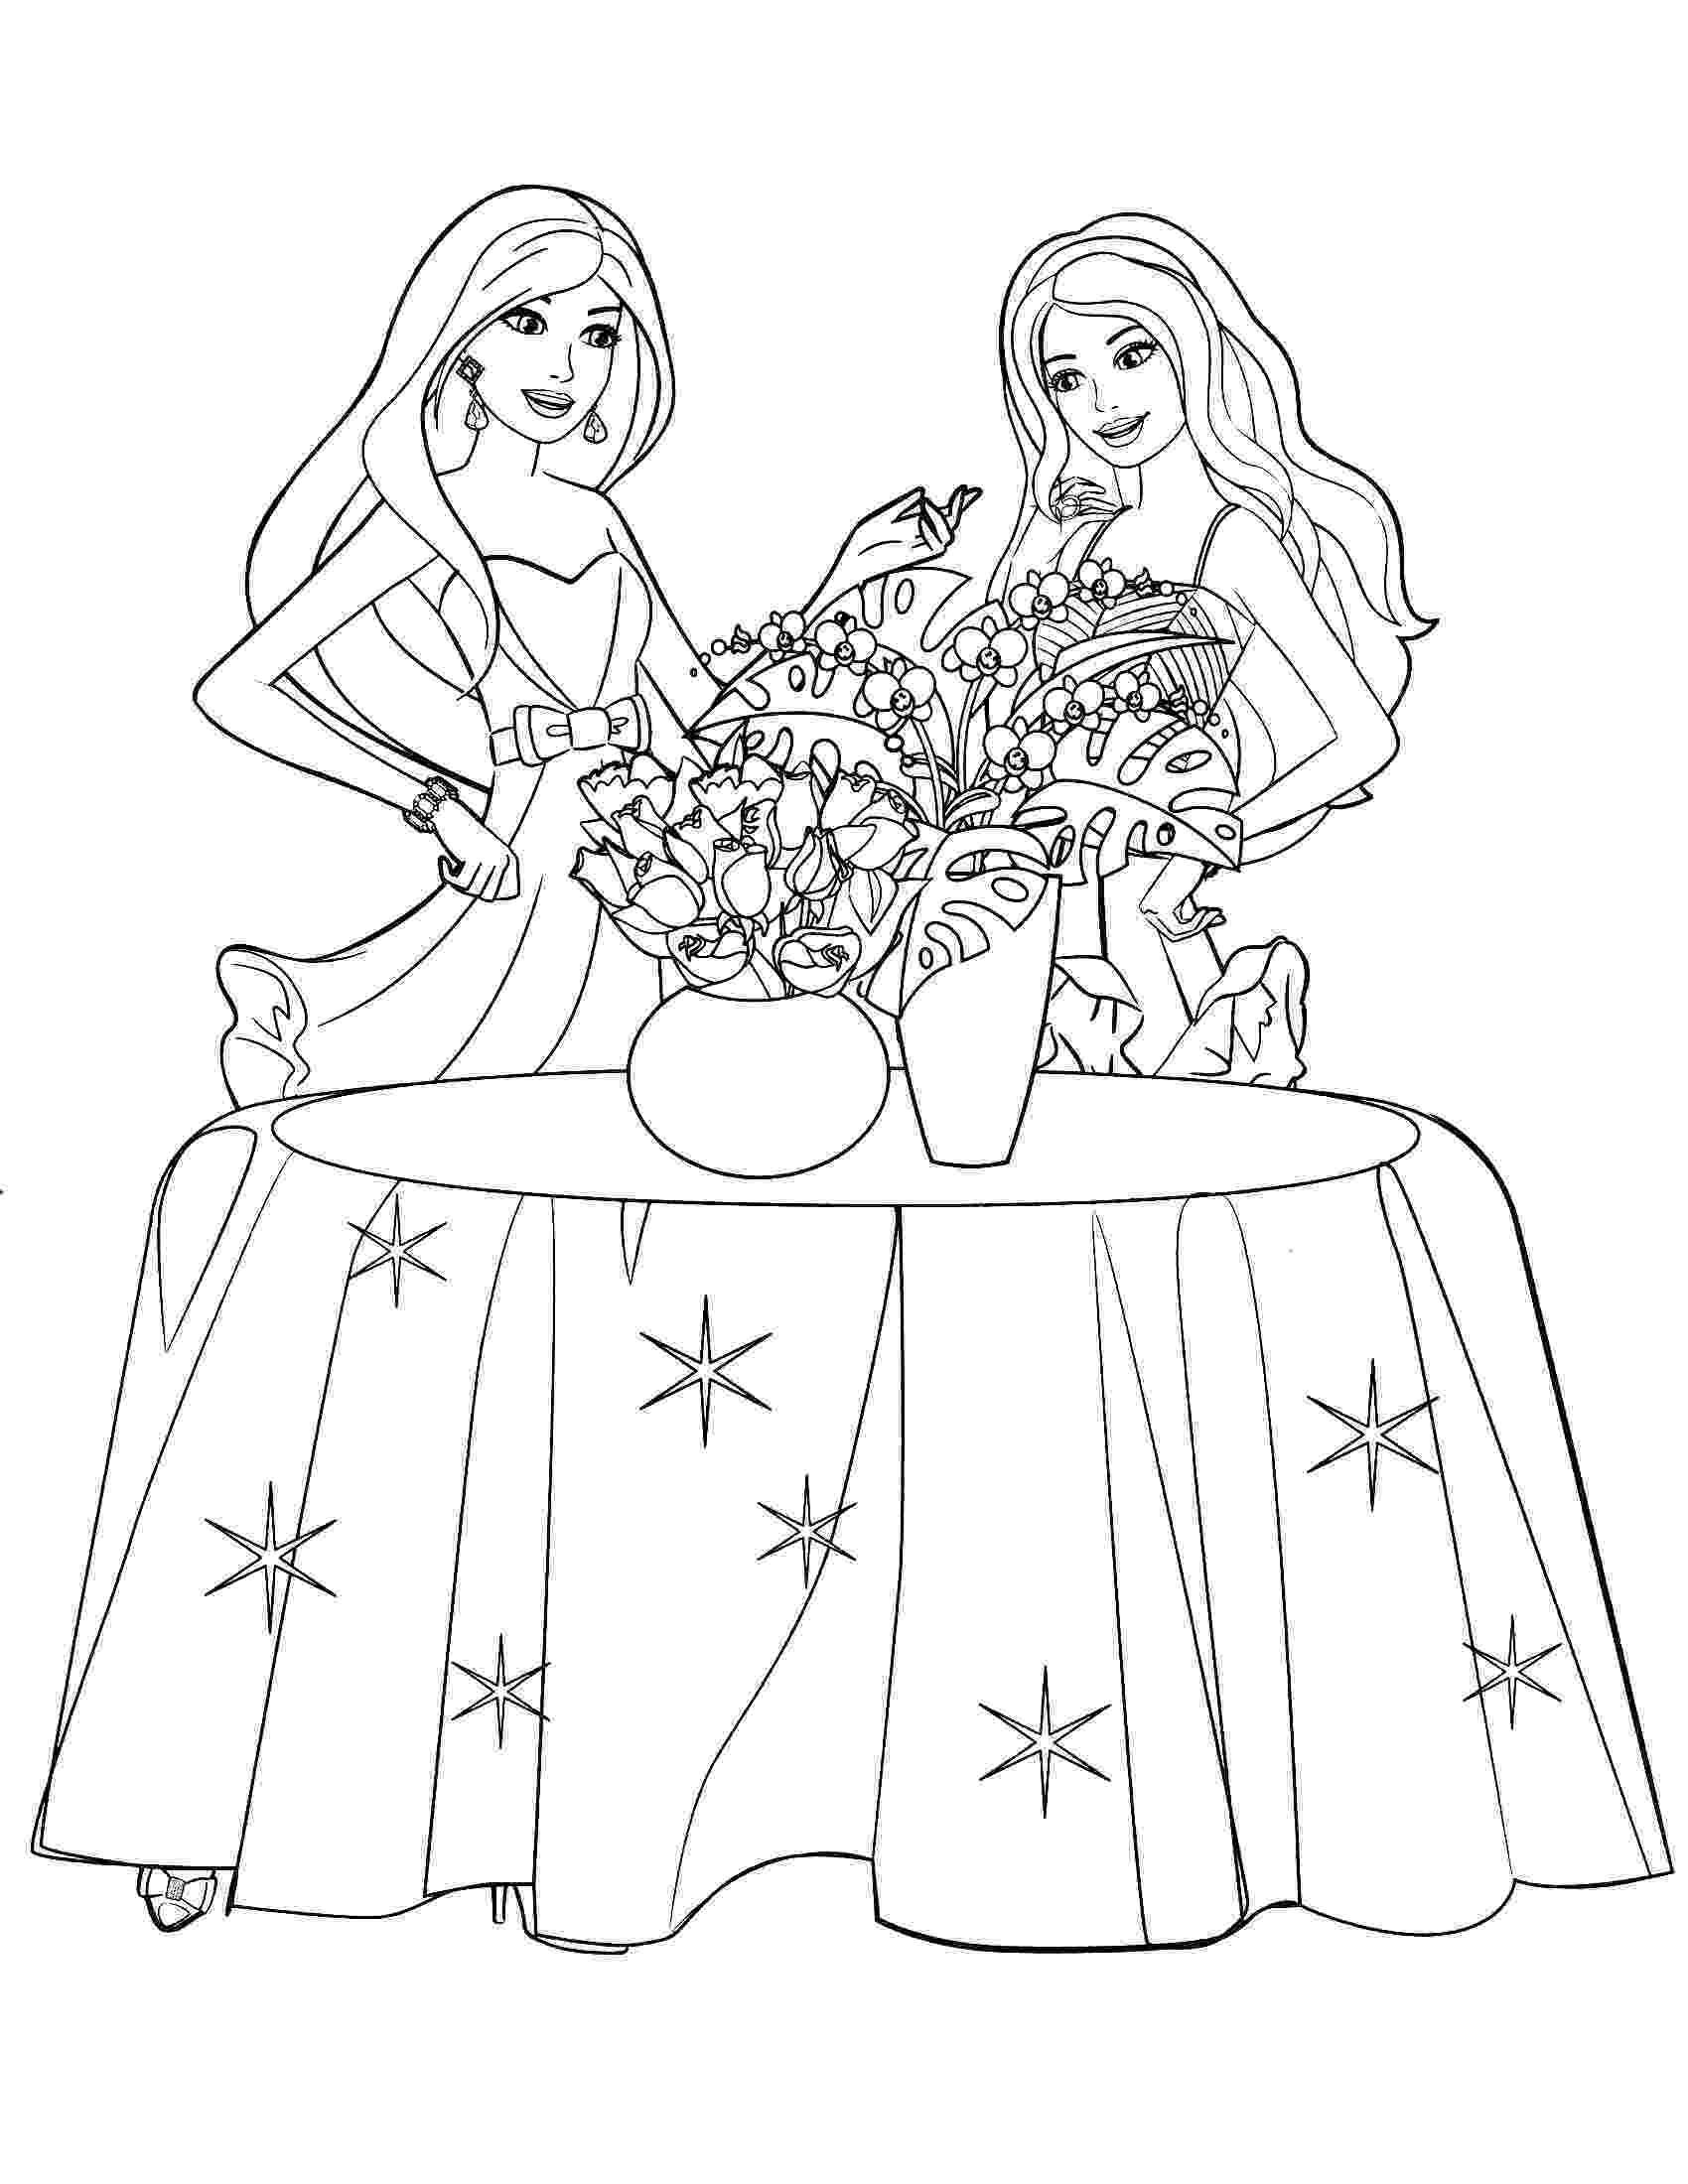 barbie coloring book free download barbie coloring pages download and print barbie coloring coloring barbie book download free